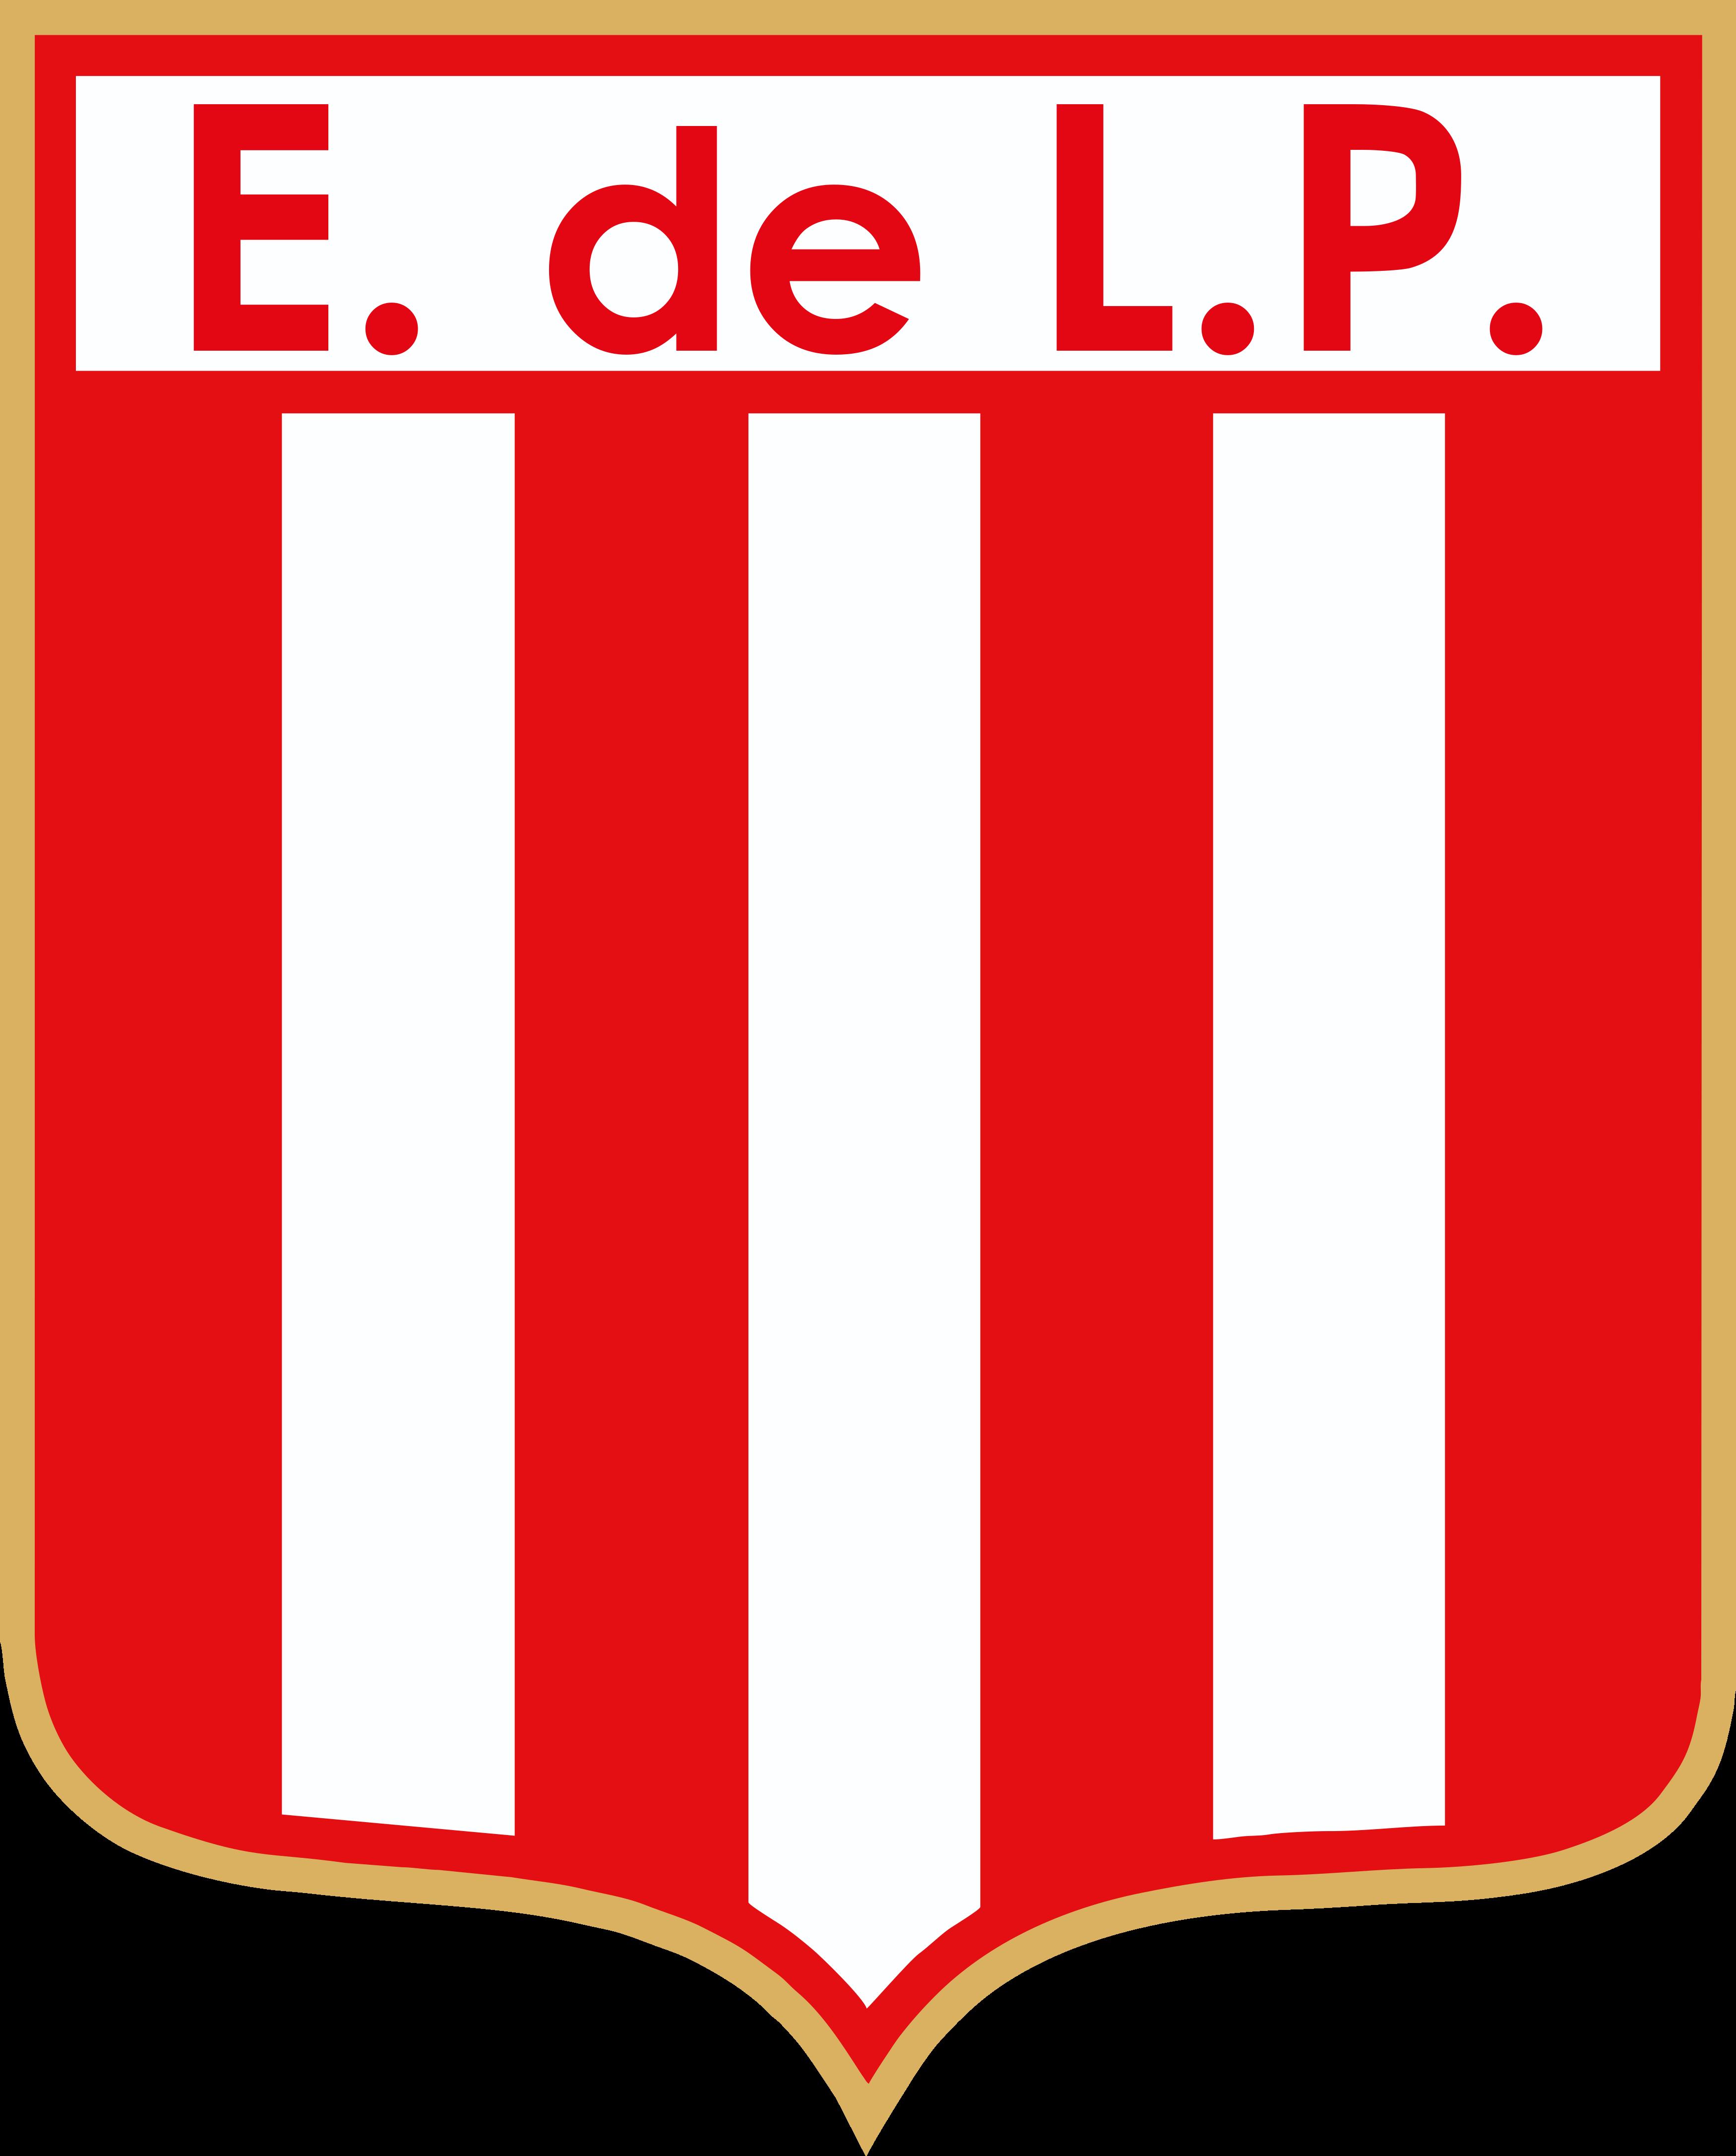 estudiantes logo escudo - Estudiantes de La Plata Logo - Escudo